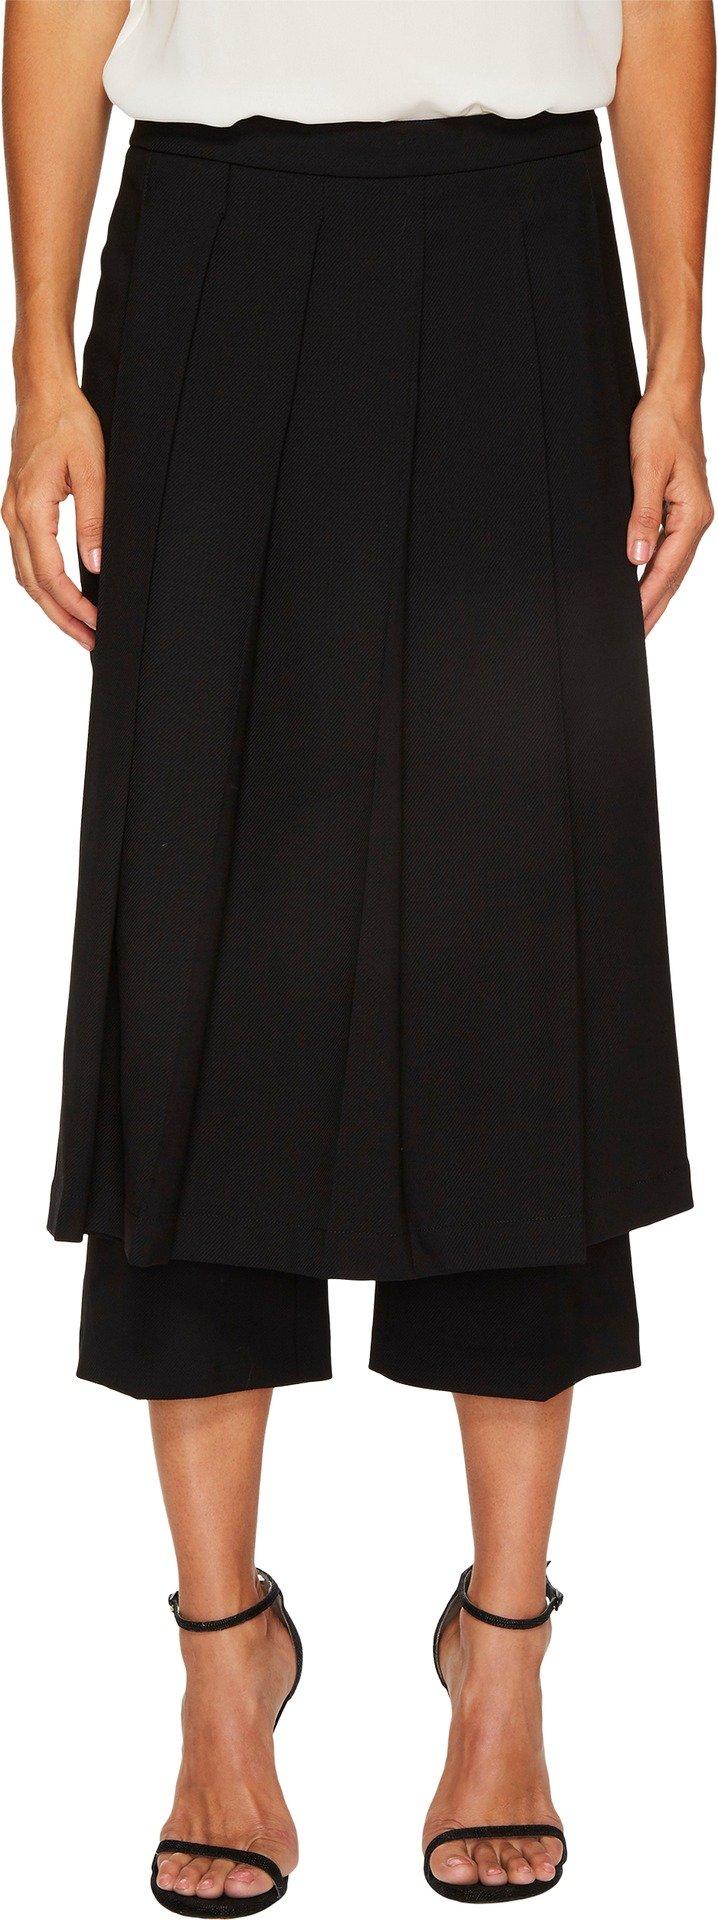 Neil Barrett Women's Fine Tricotine Skirt Pants Black 42